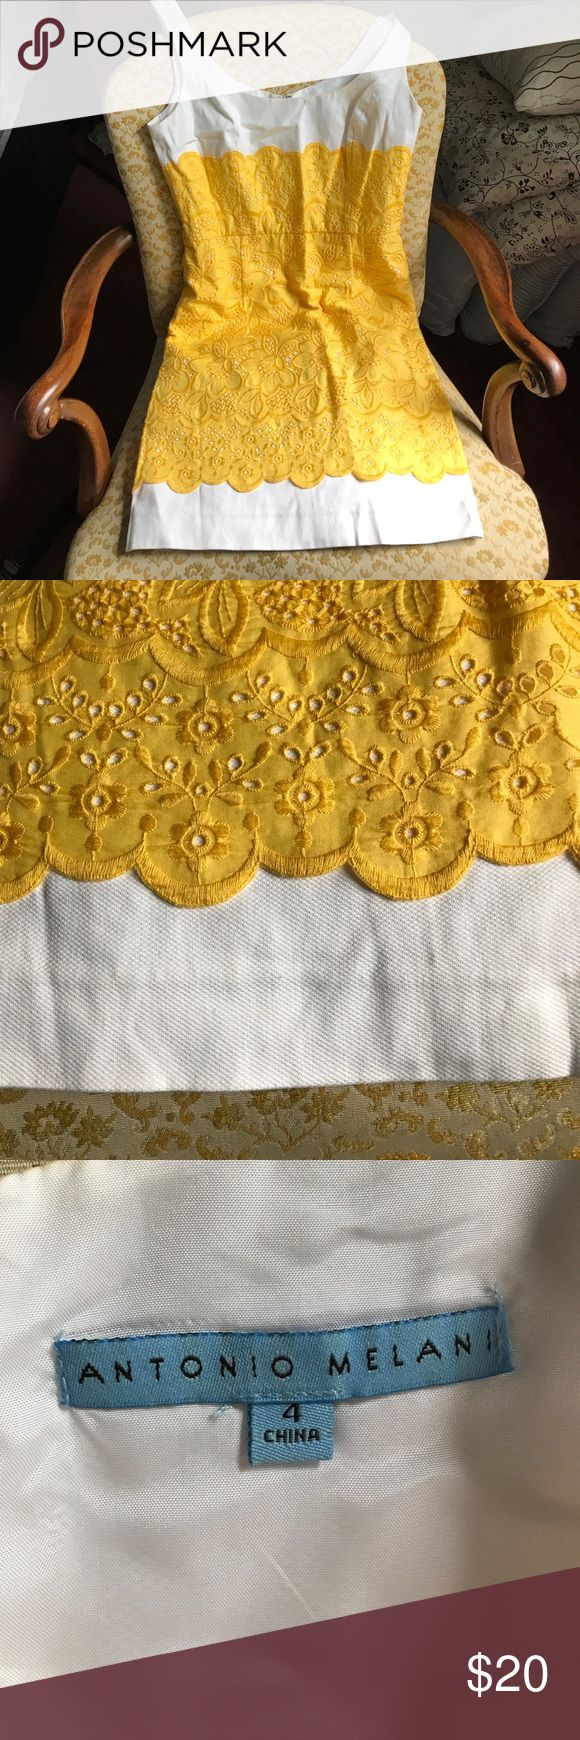 Antonio Melani yellow and white low-back dress 👗 Antonio Melani yellow and white low-back dress 👗 ANTONIO MELANI Dresses